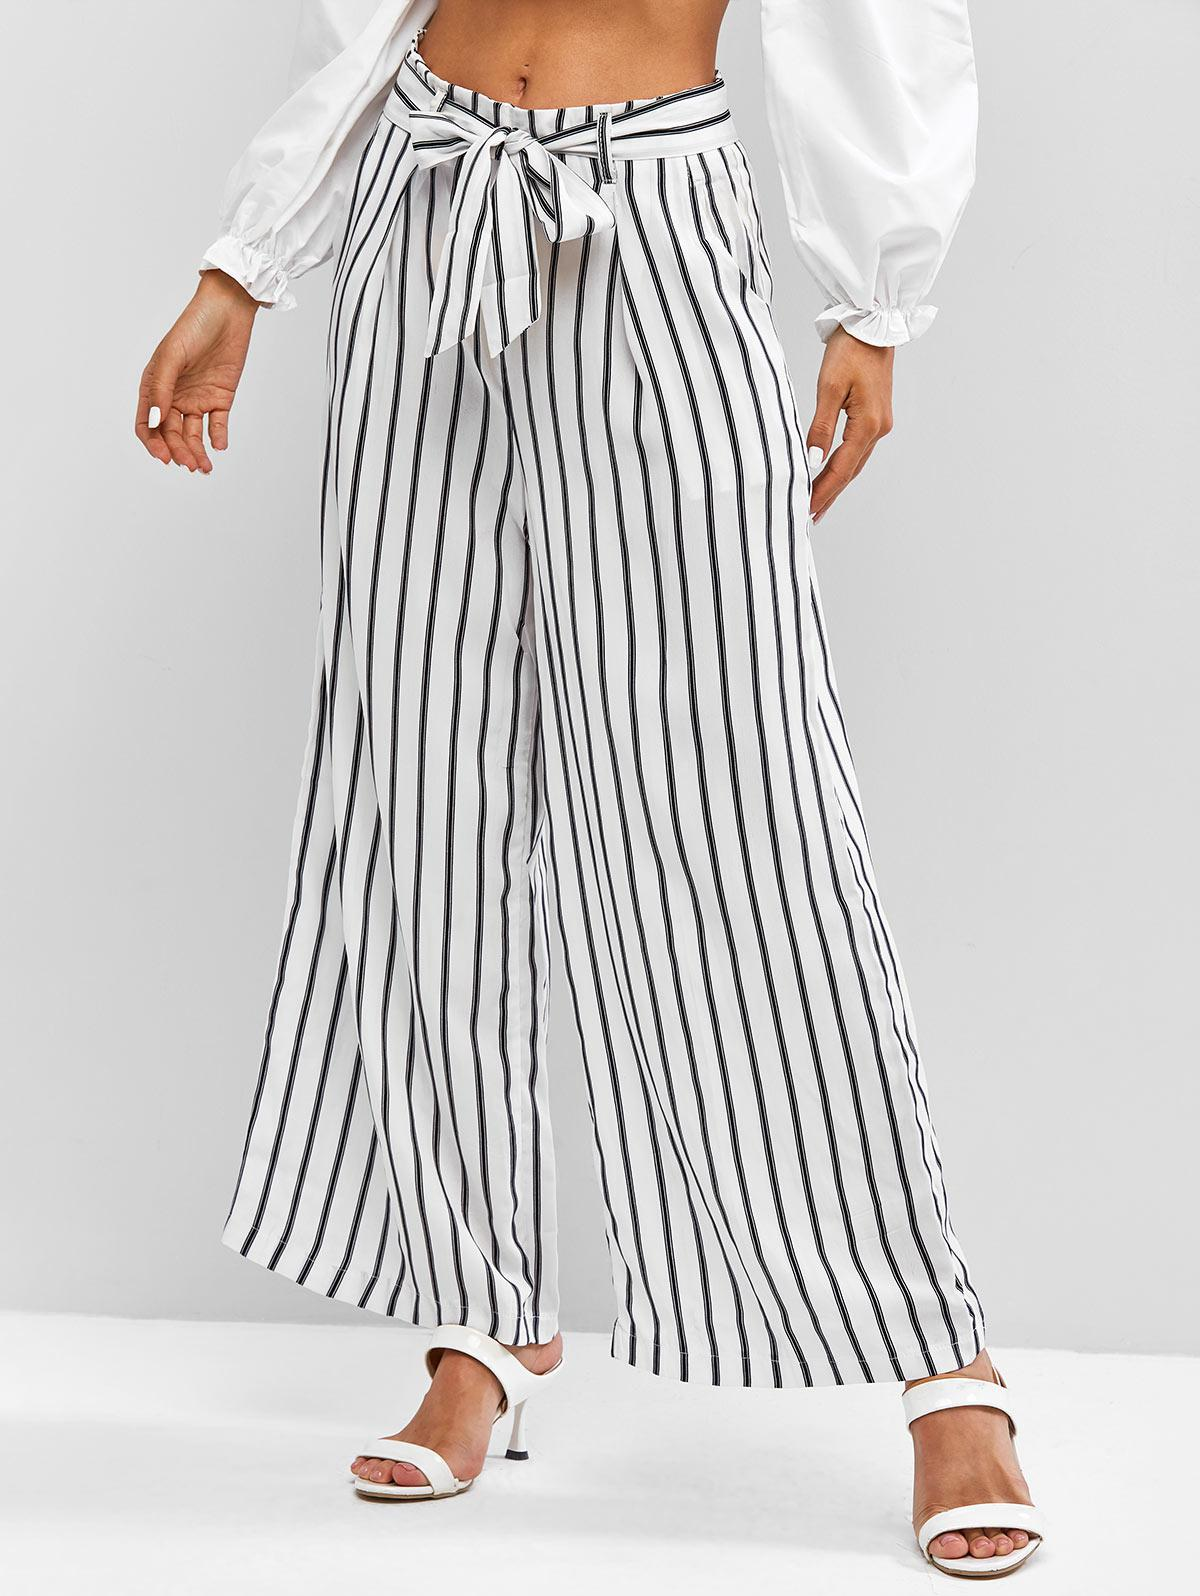 Belted Stripes Wide Leg Pants